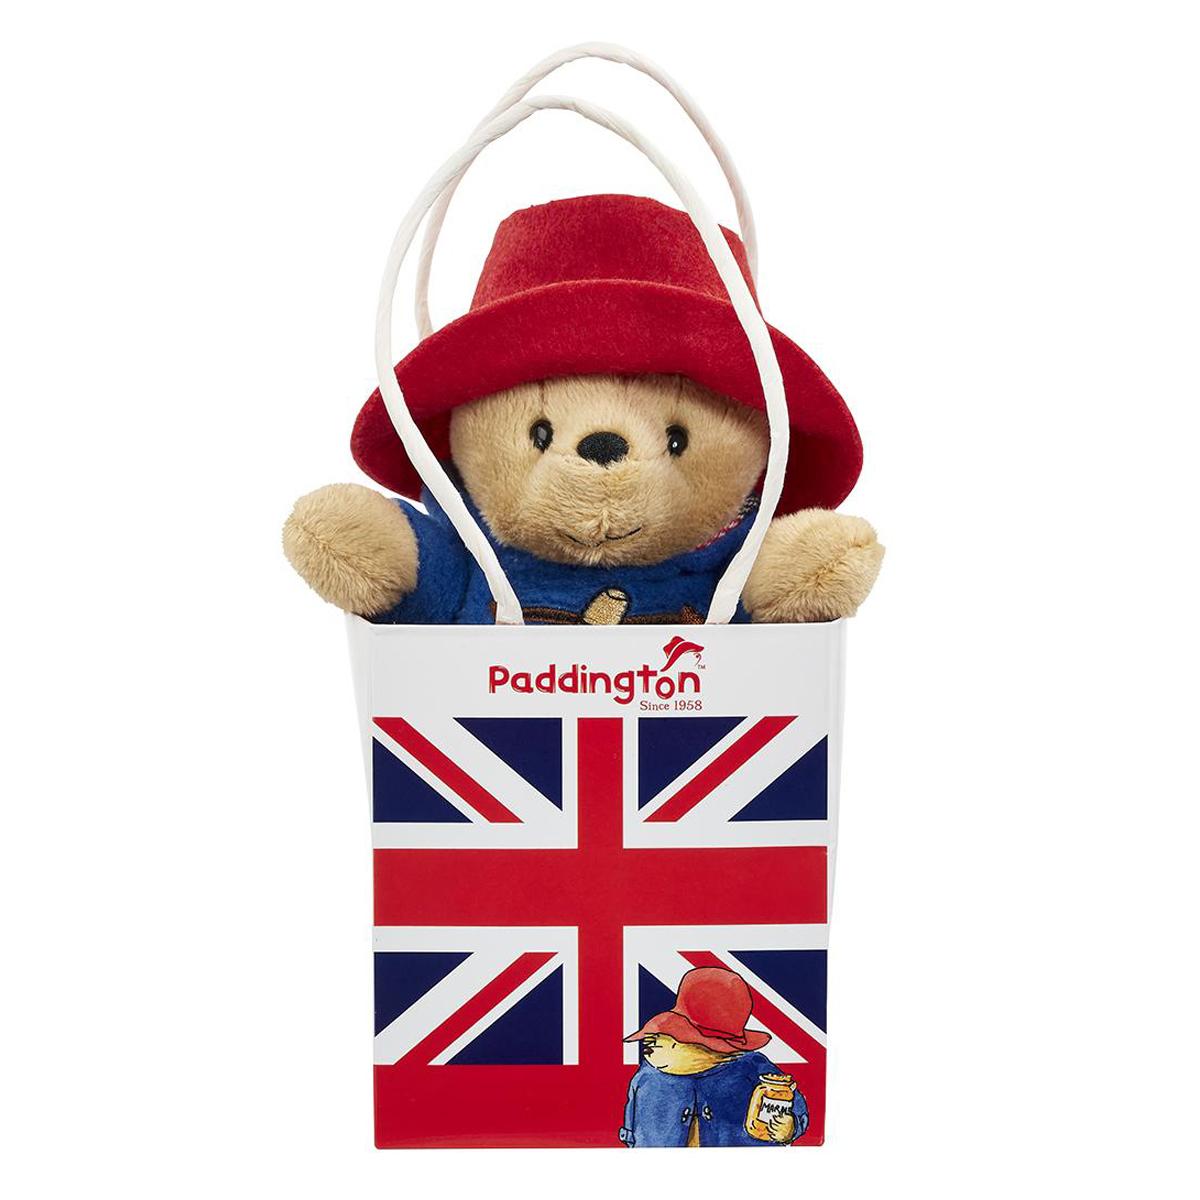 Paddington Bear Little Paddington Bear in Union Jack Bag